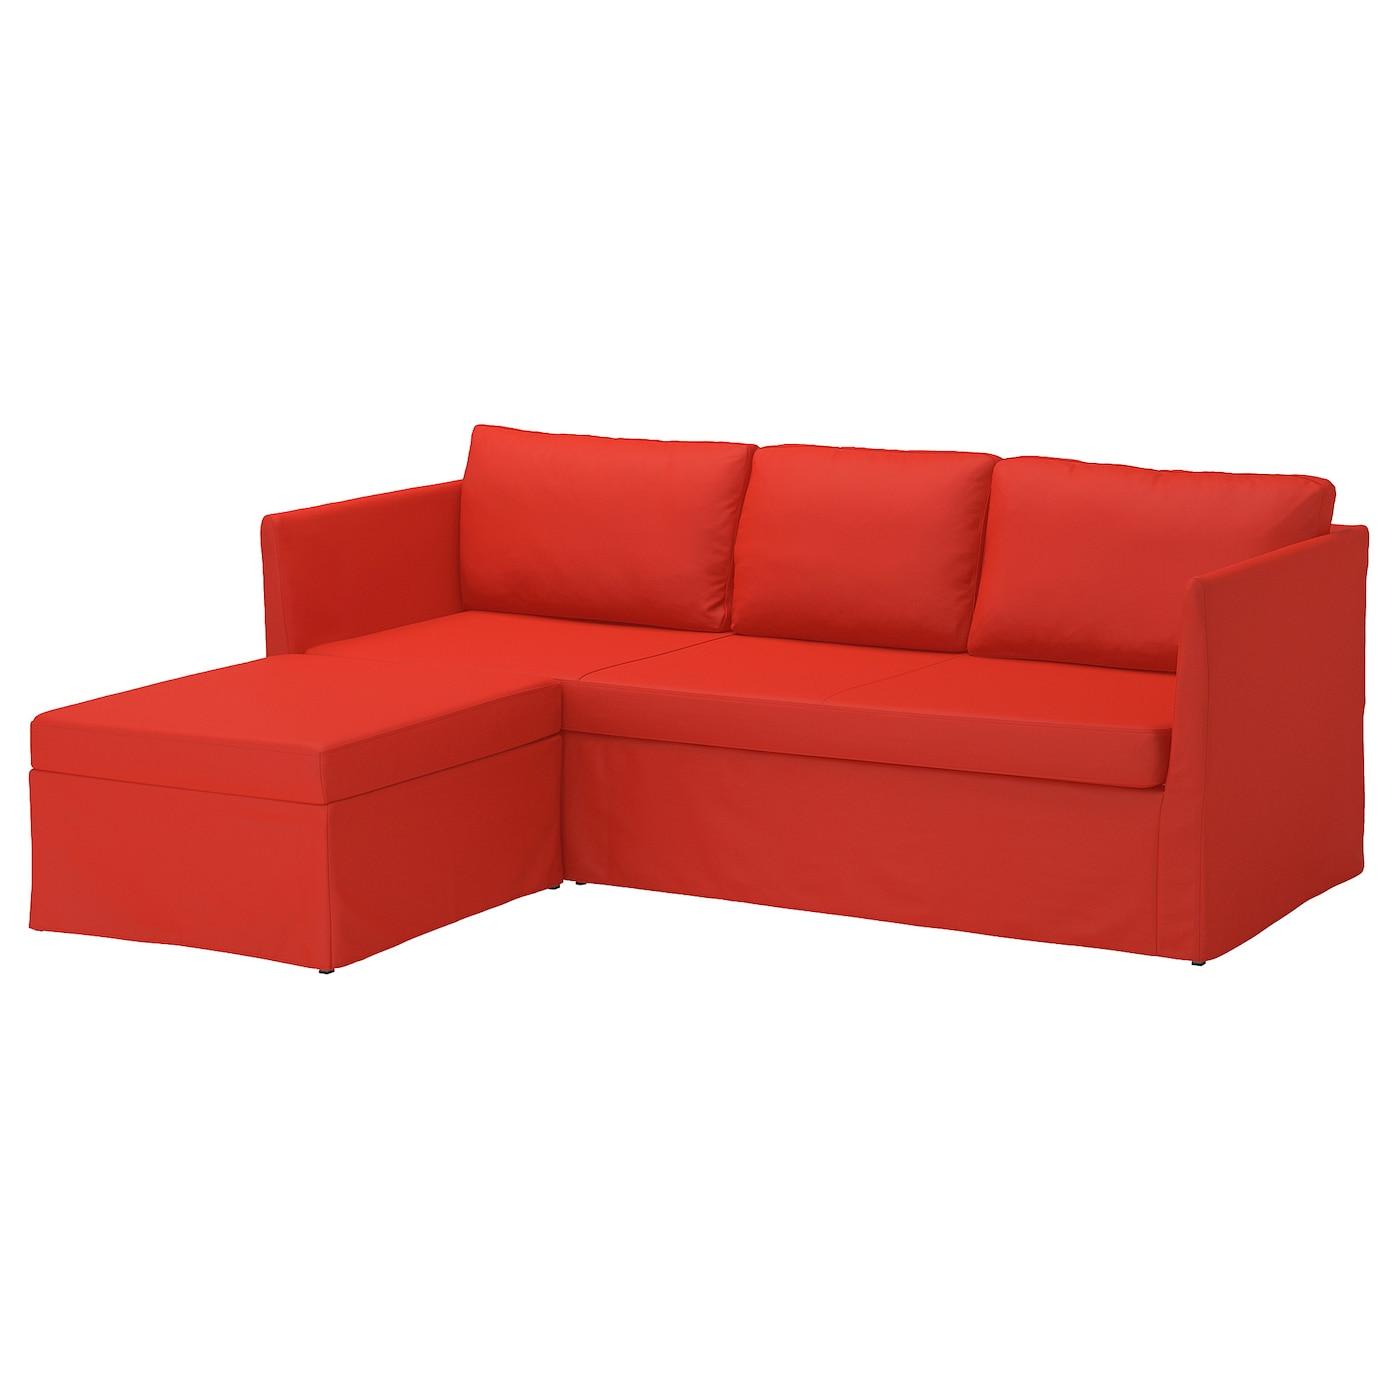 Br thult corner sofa bed vissle red orange ikea for Red corner sofa